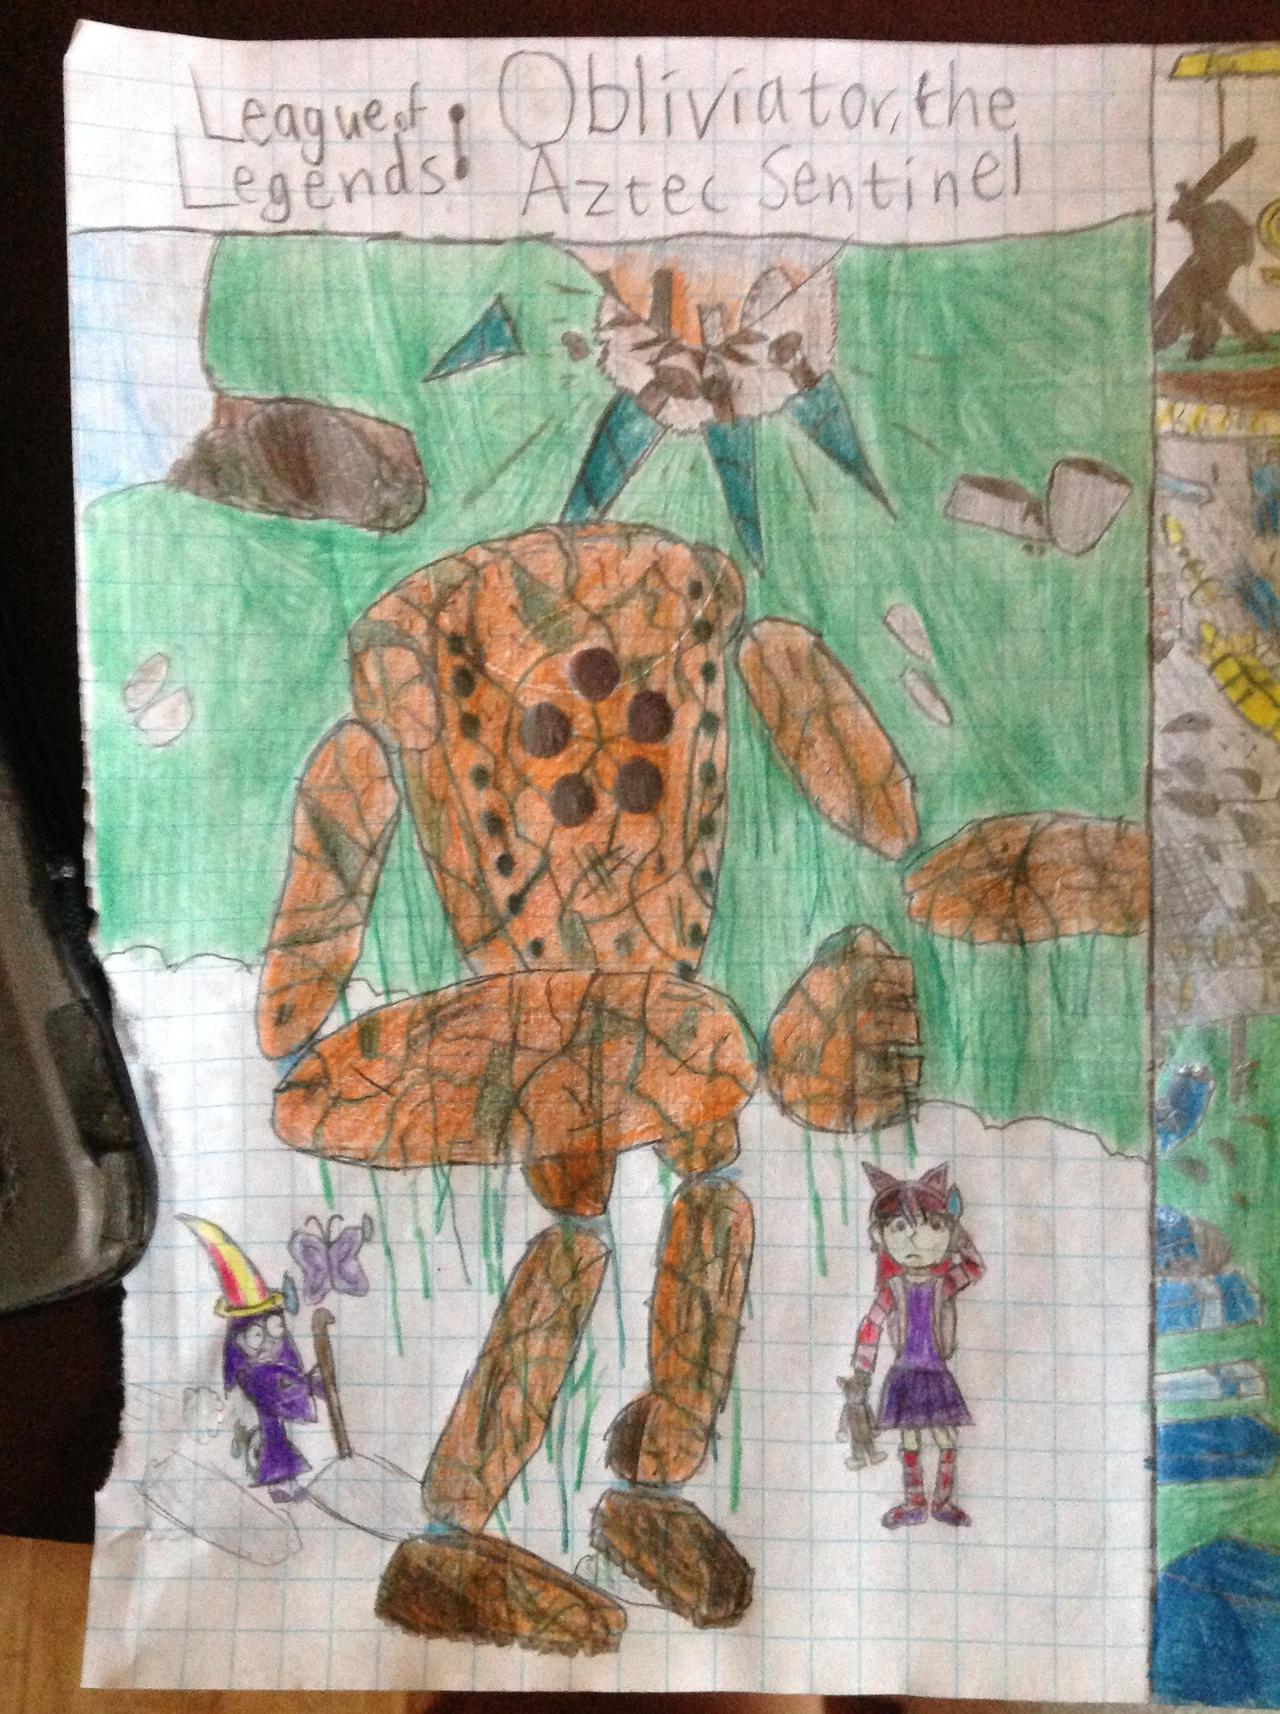 League of Legends - Obliviator, the Aztec Sentinel by derekguo31